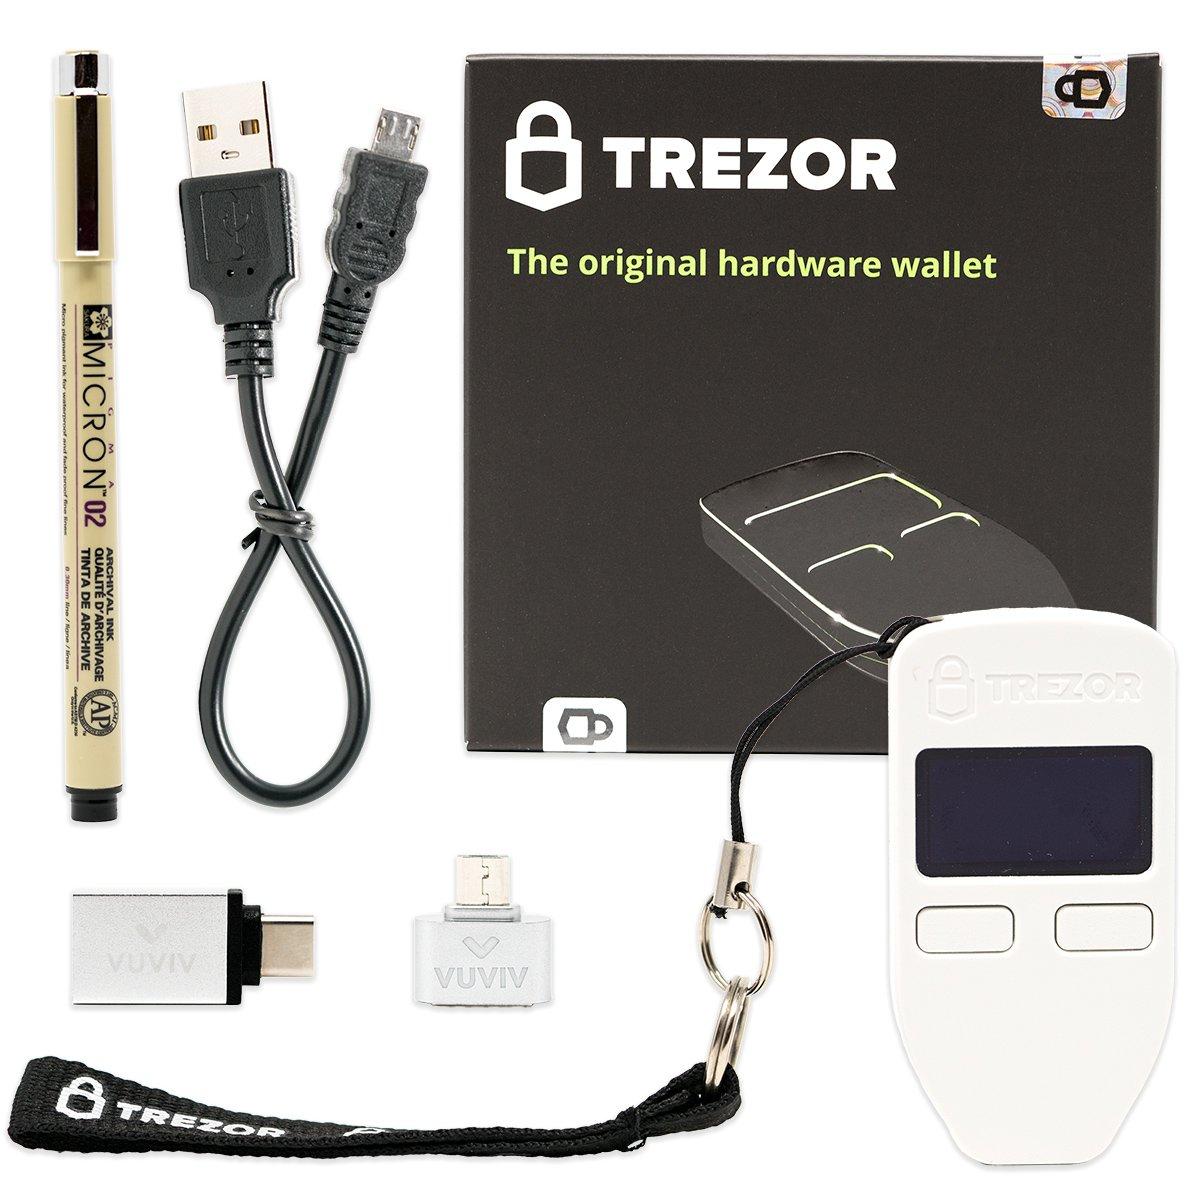 Trezor (White) Bitcoin Hardware Wallet with VUVIV Micro-USB Adapter, VUVIV USB-C Adapter for MacBook and Sakura Pigma Archival Ink Pen (4 items)